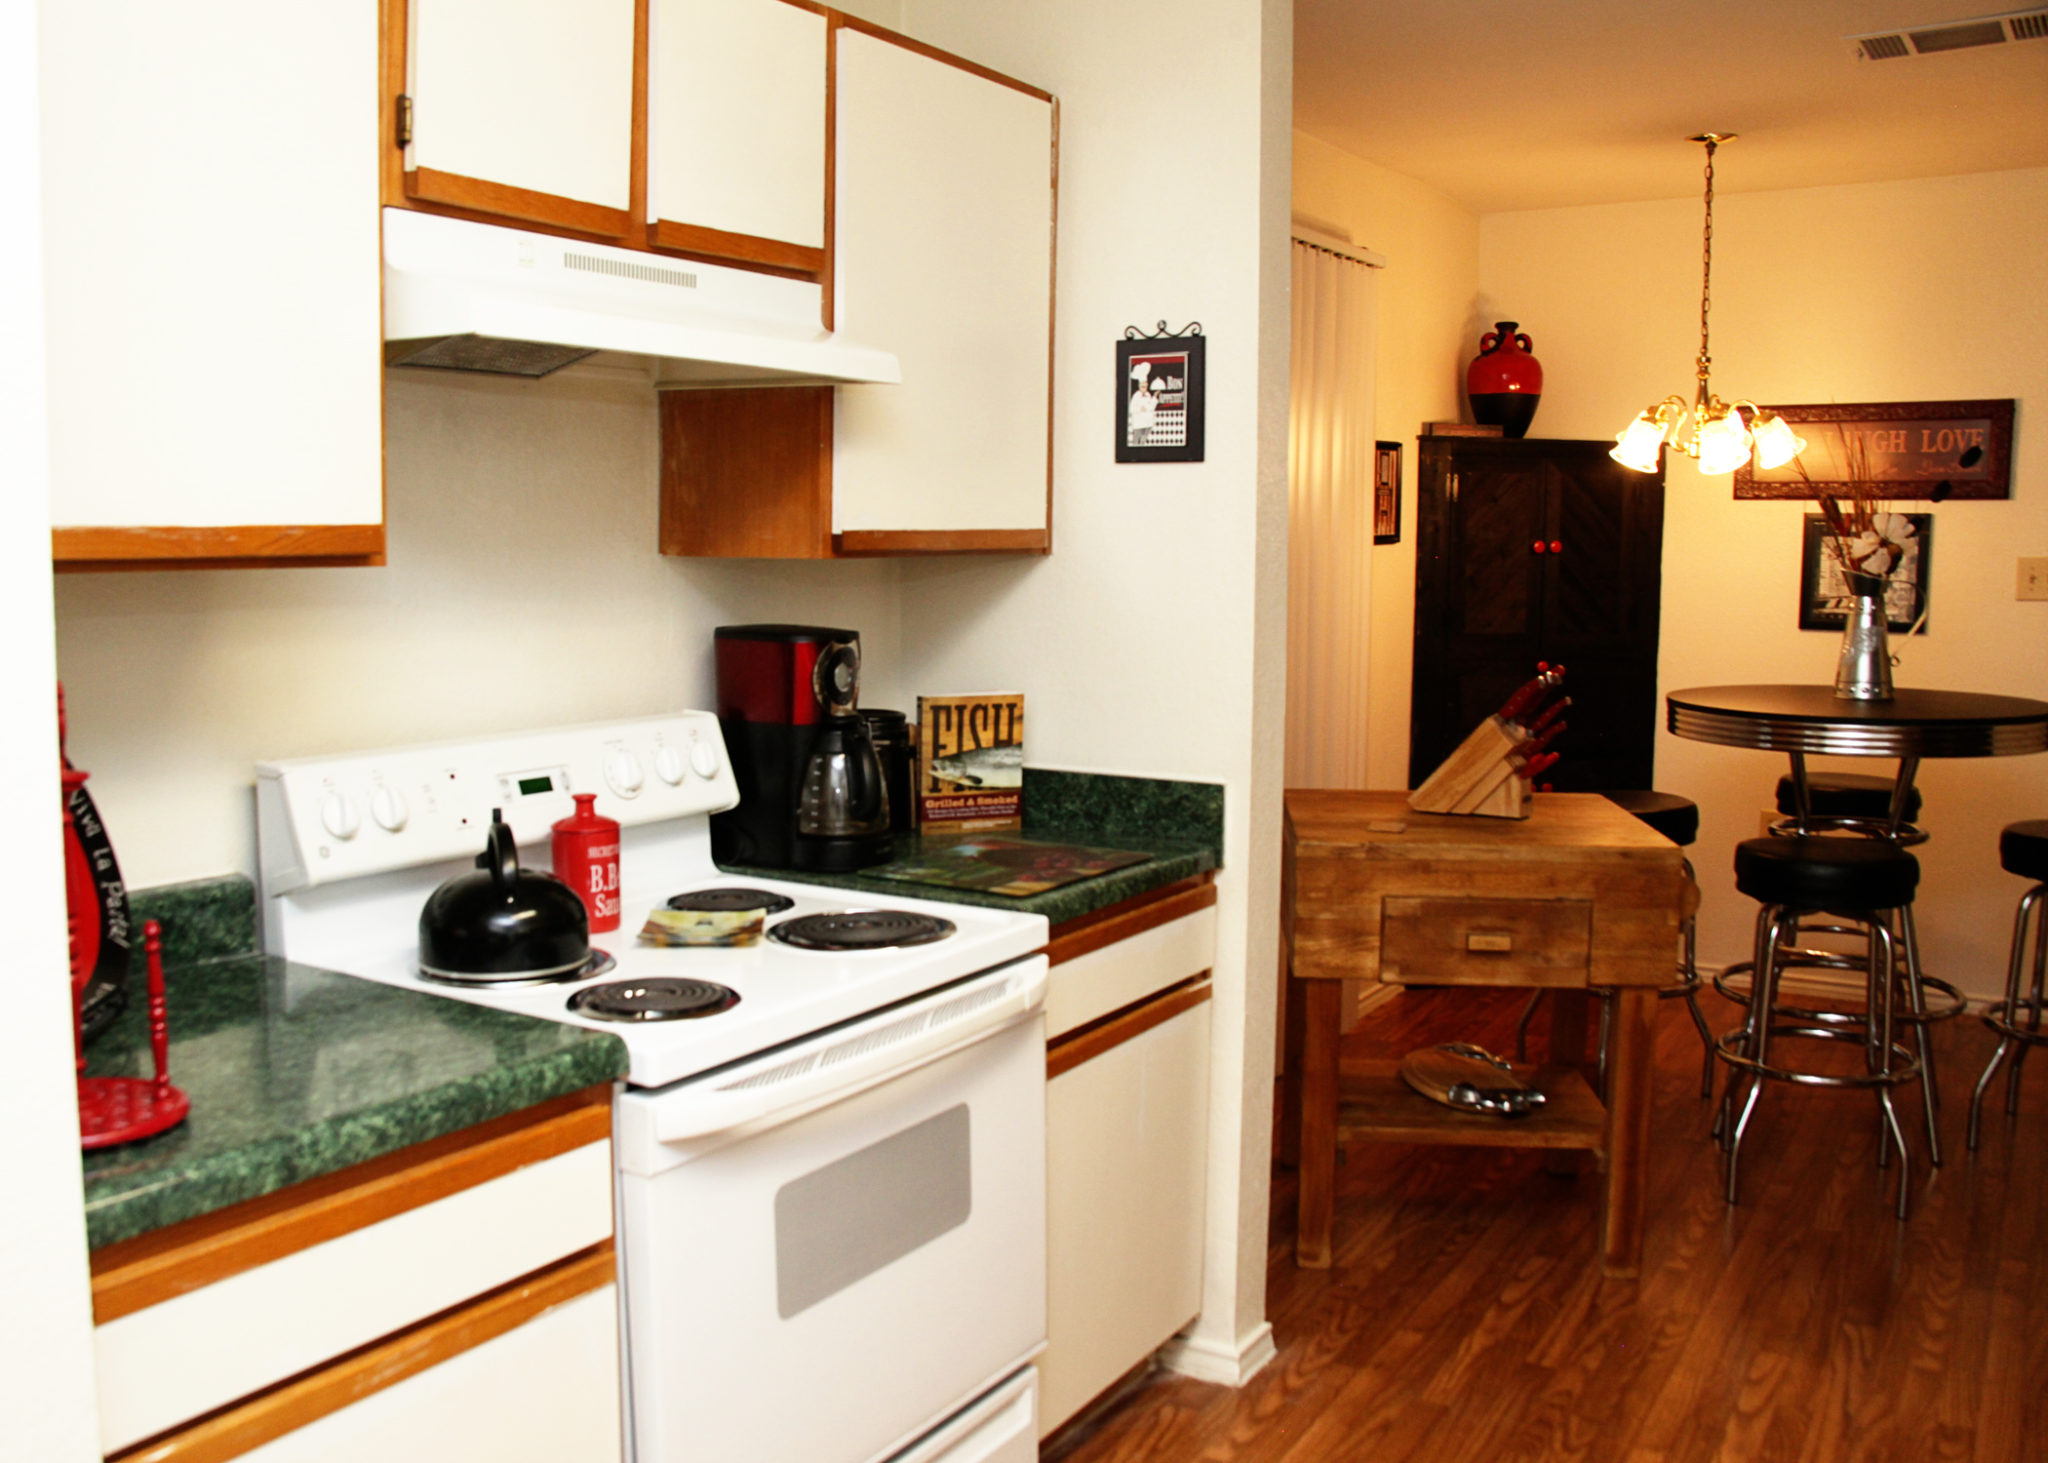 Ridgeview Townhomes, Paris, TX, Apt. Dining Room, Kitchen2